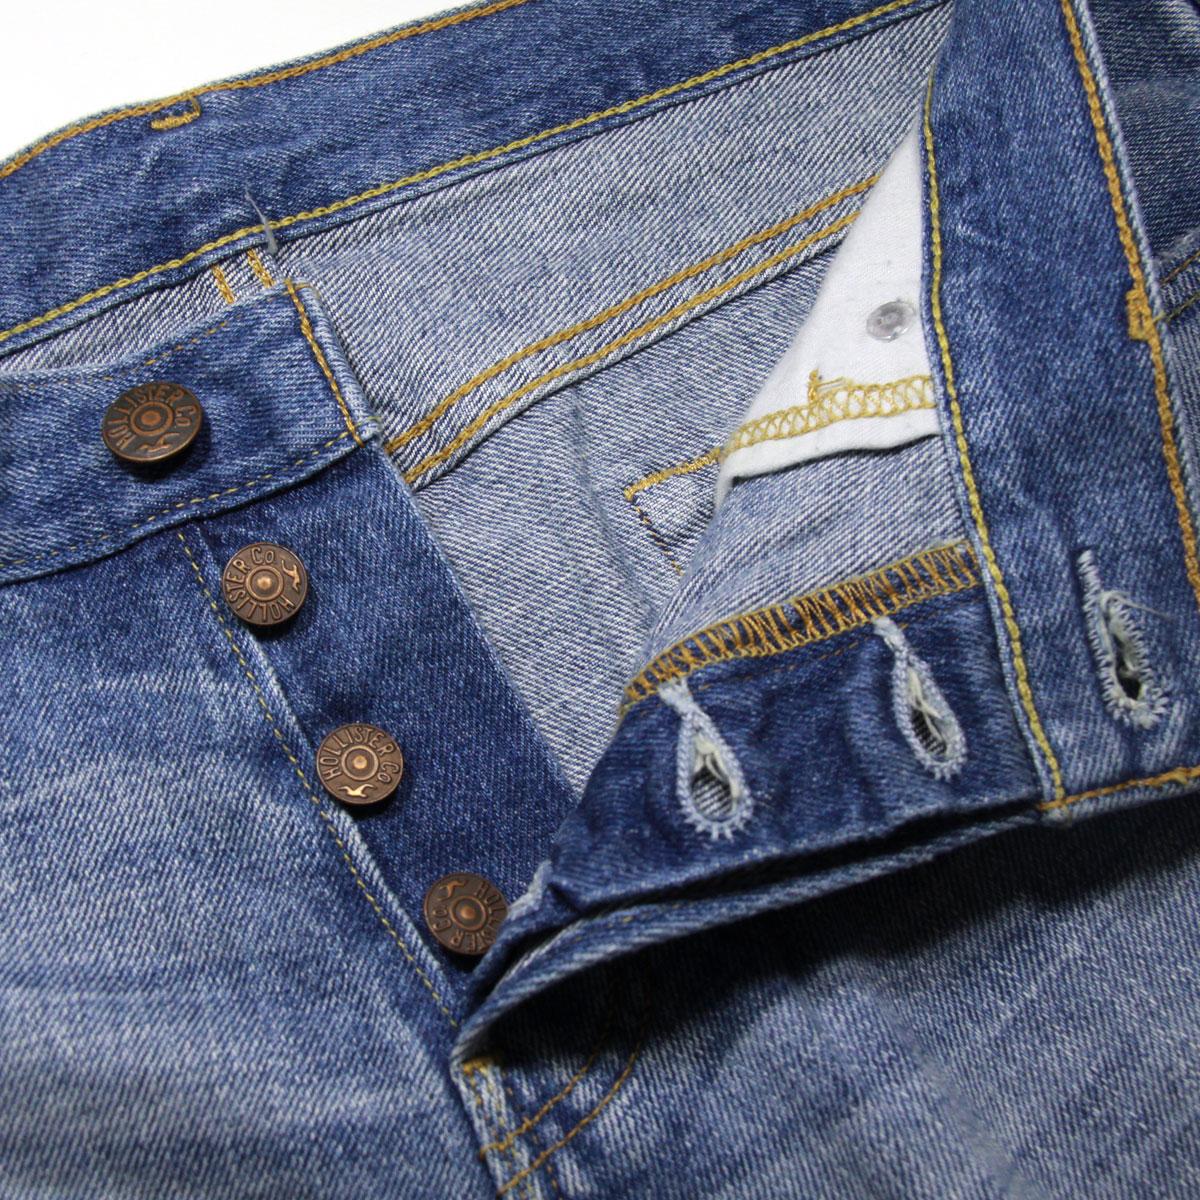 7 inseam mens shorts